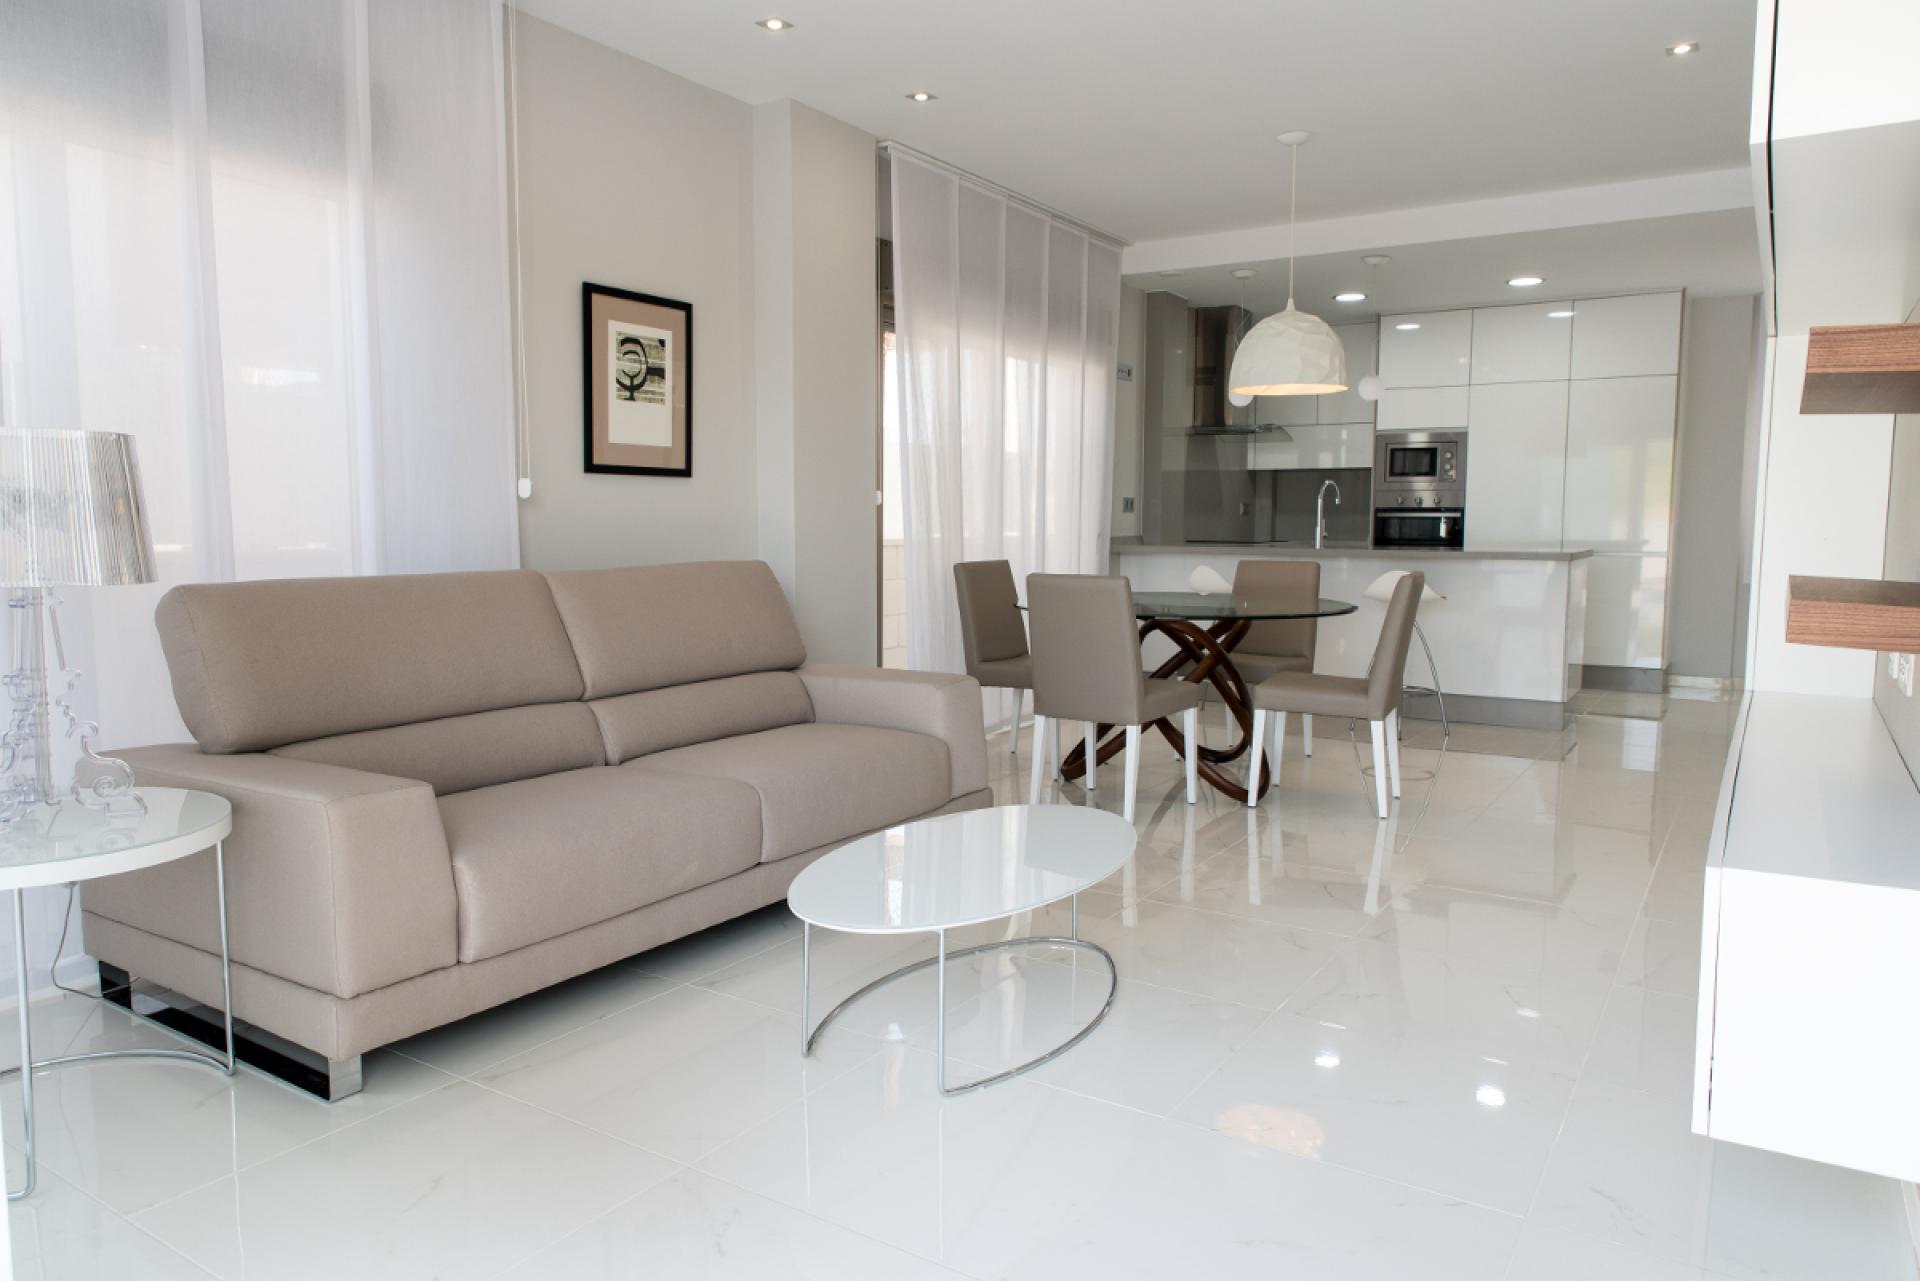 Villa with 3 bedrooms and private pool in Villamartin in Medvilla Spanje